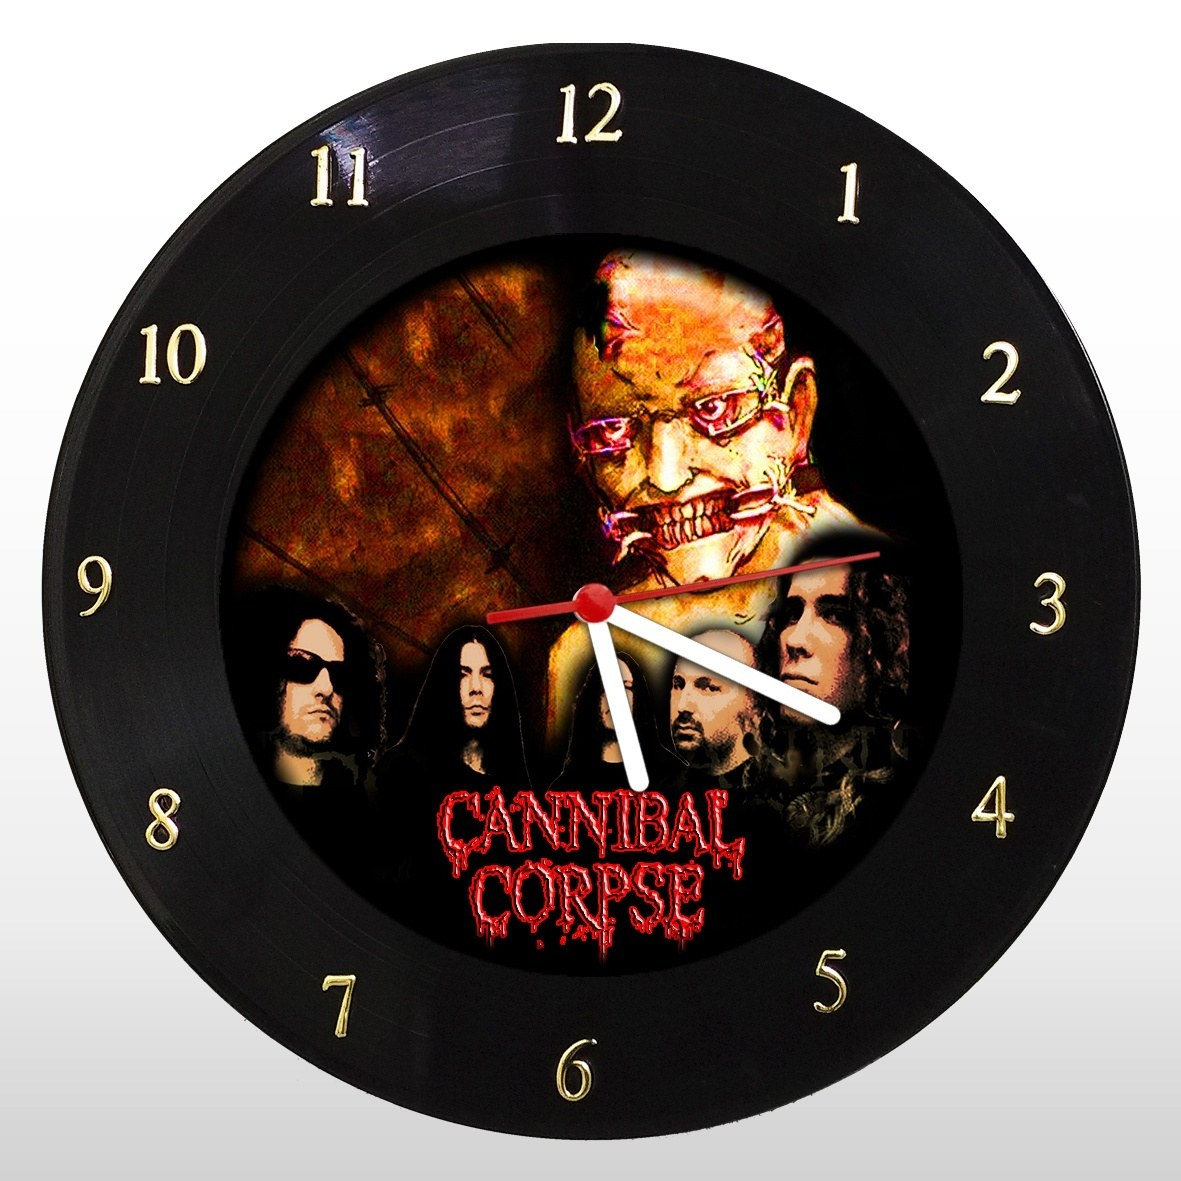 Cannibal Corpse - Relógio de Parede em Disco de Vinil - Mr. Rock